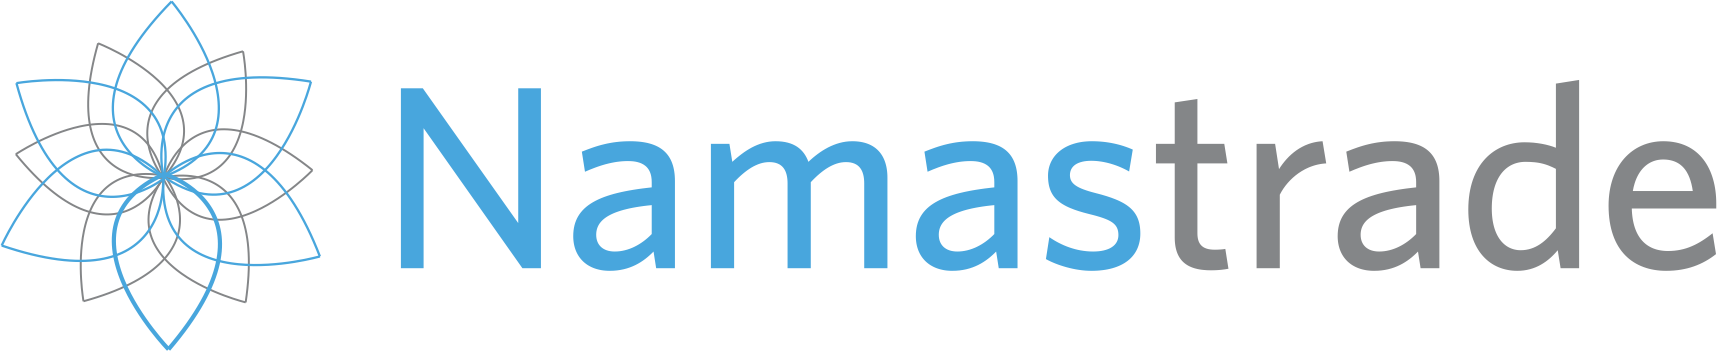 Namastrade